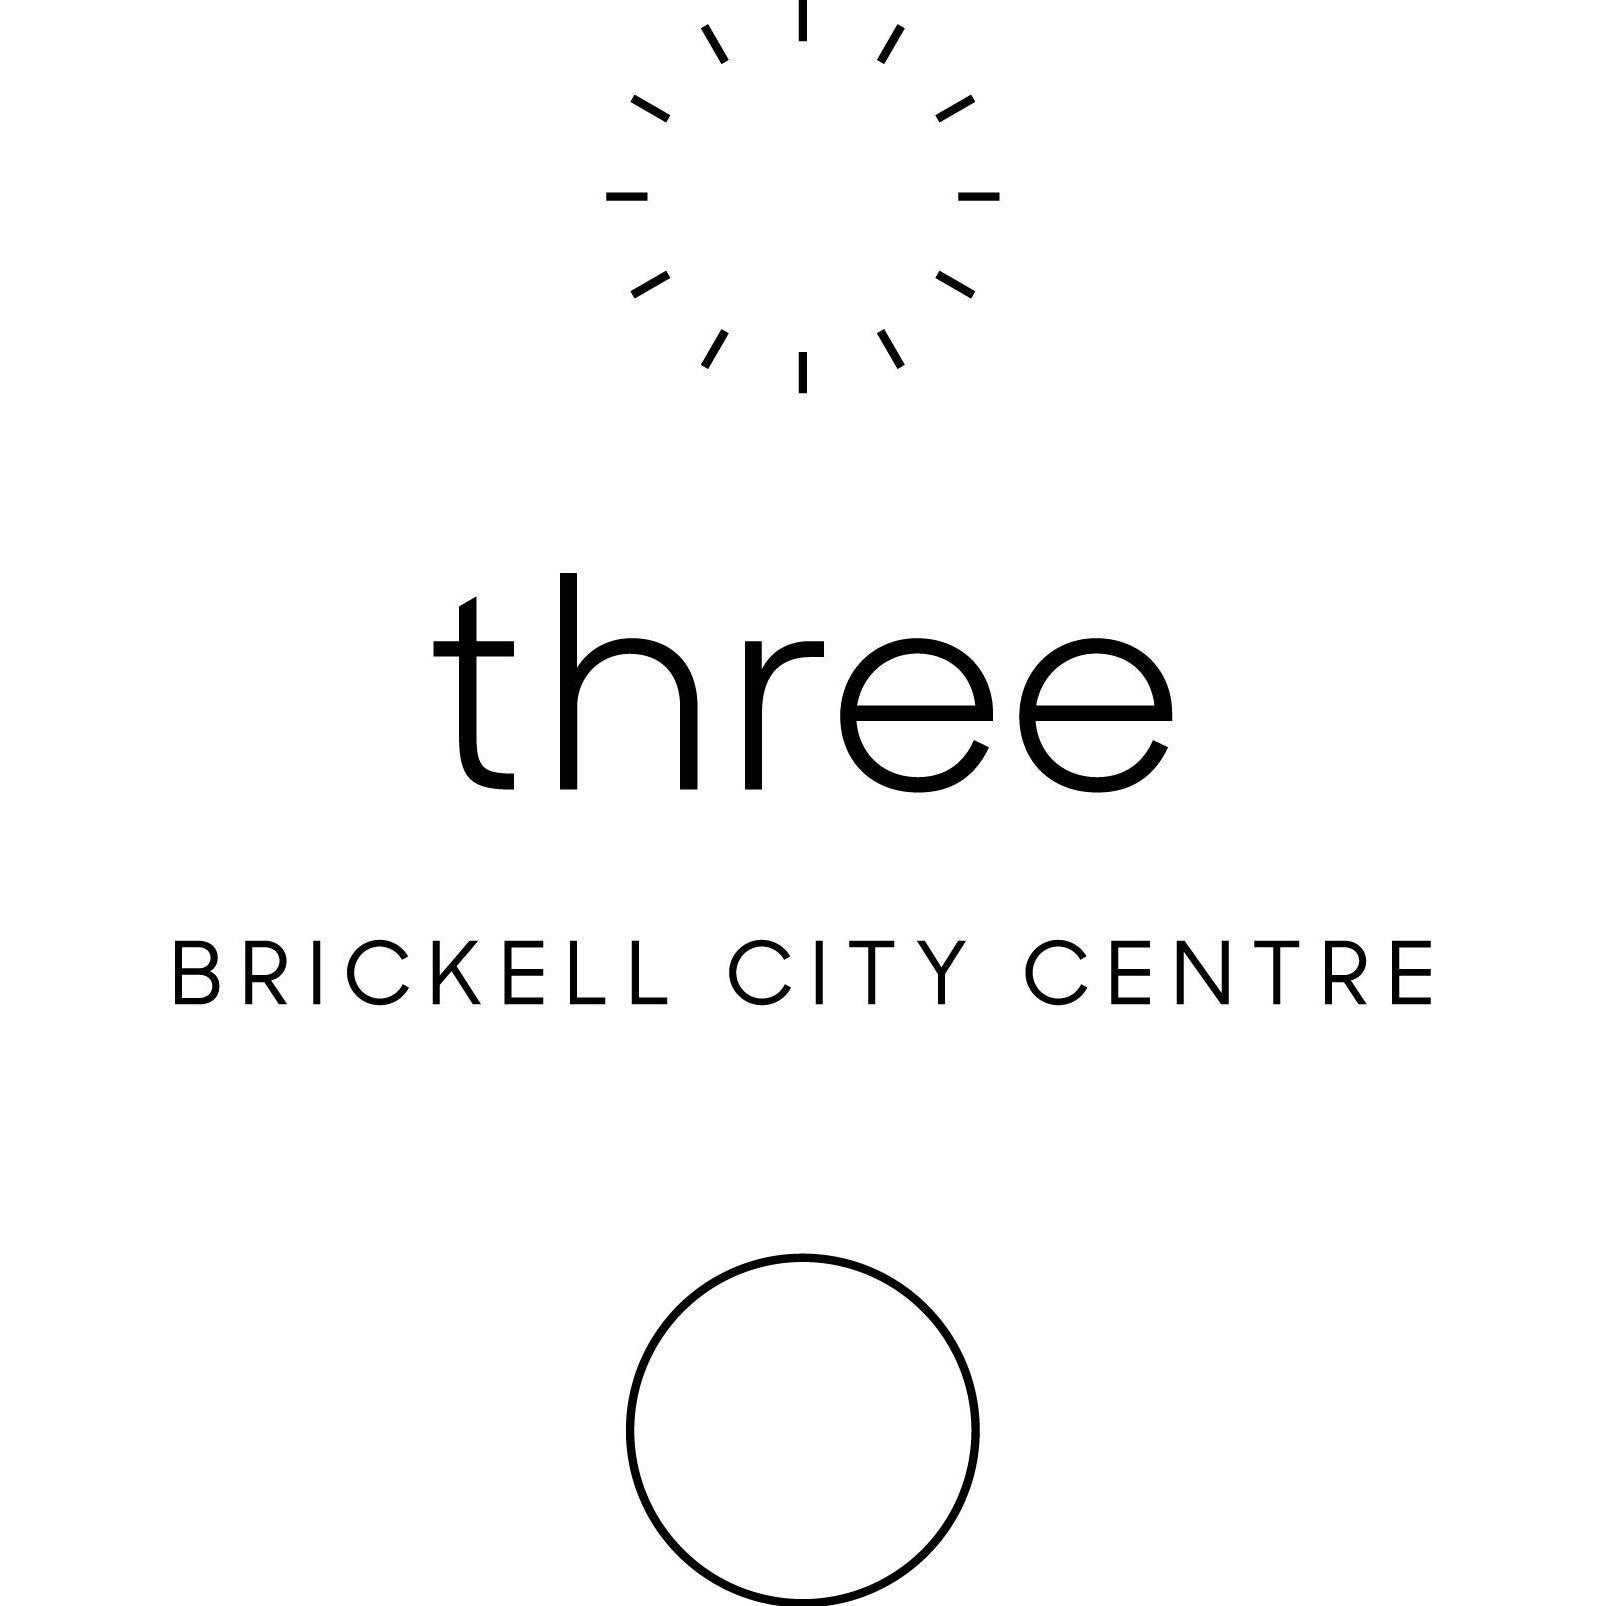 Three Brickell City Centre